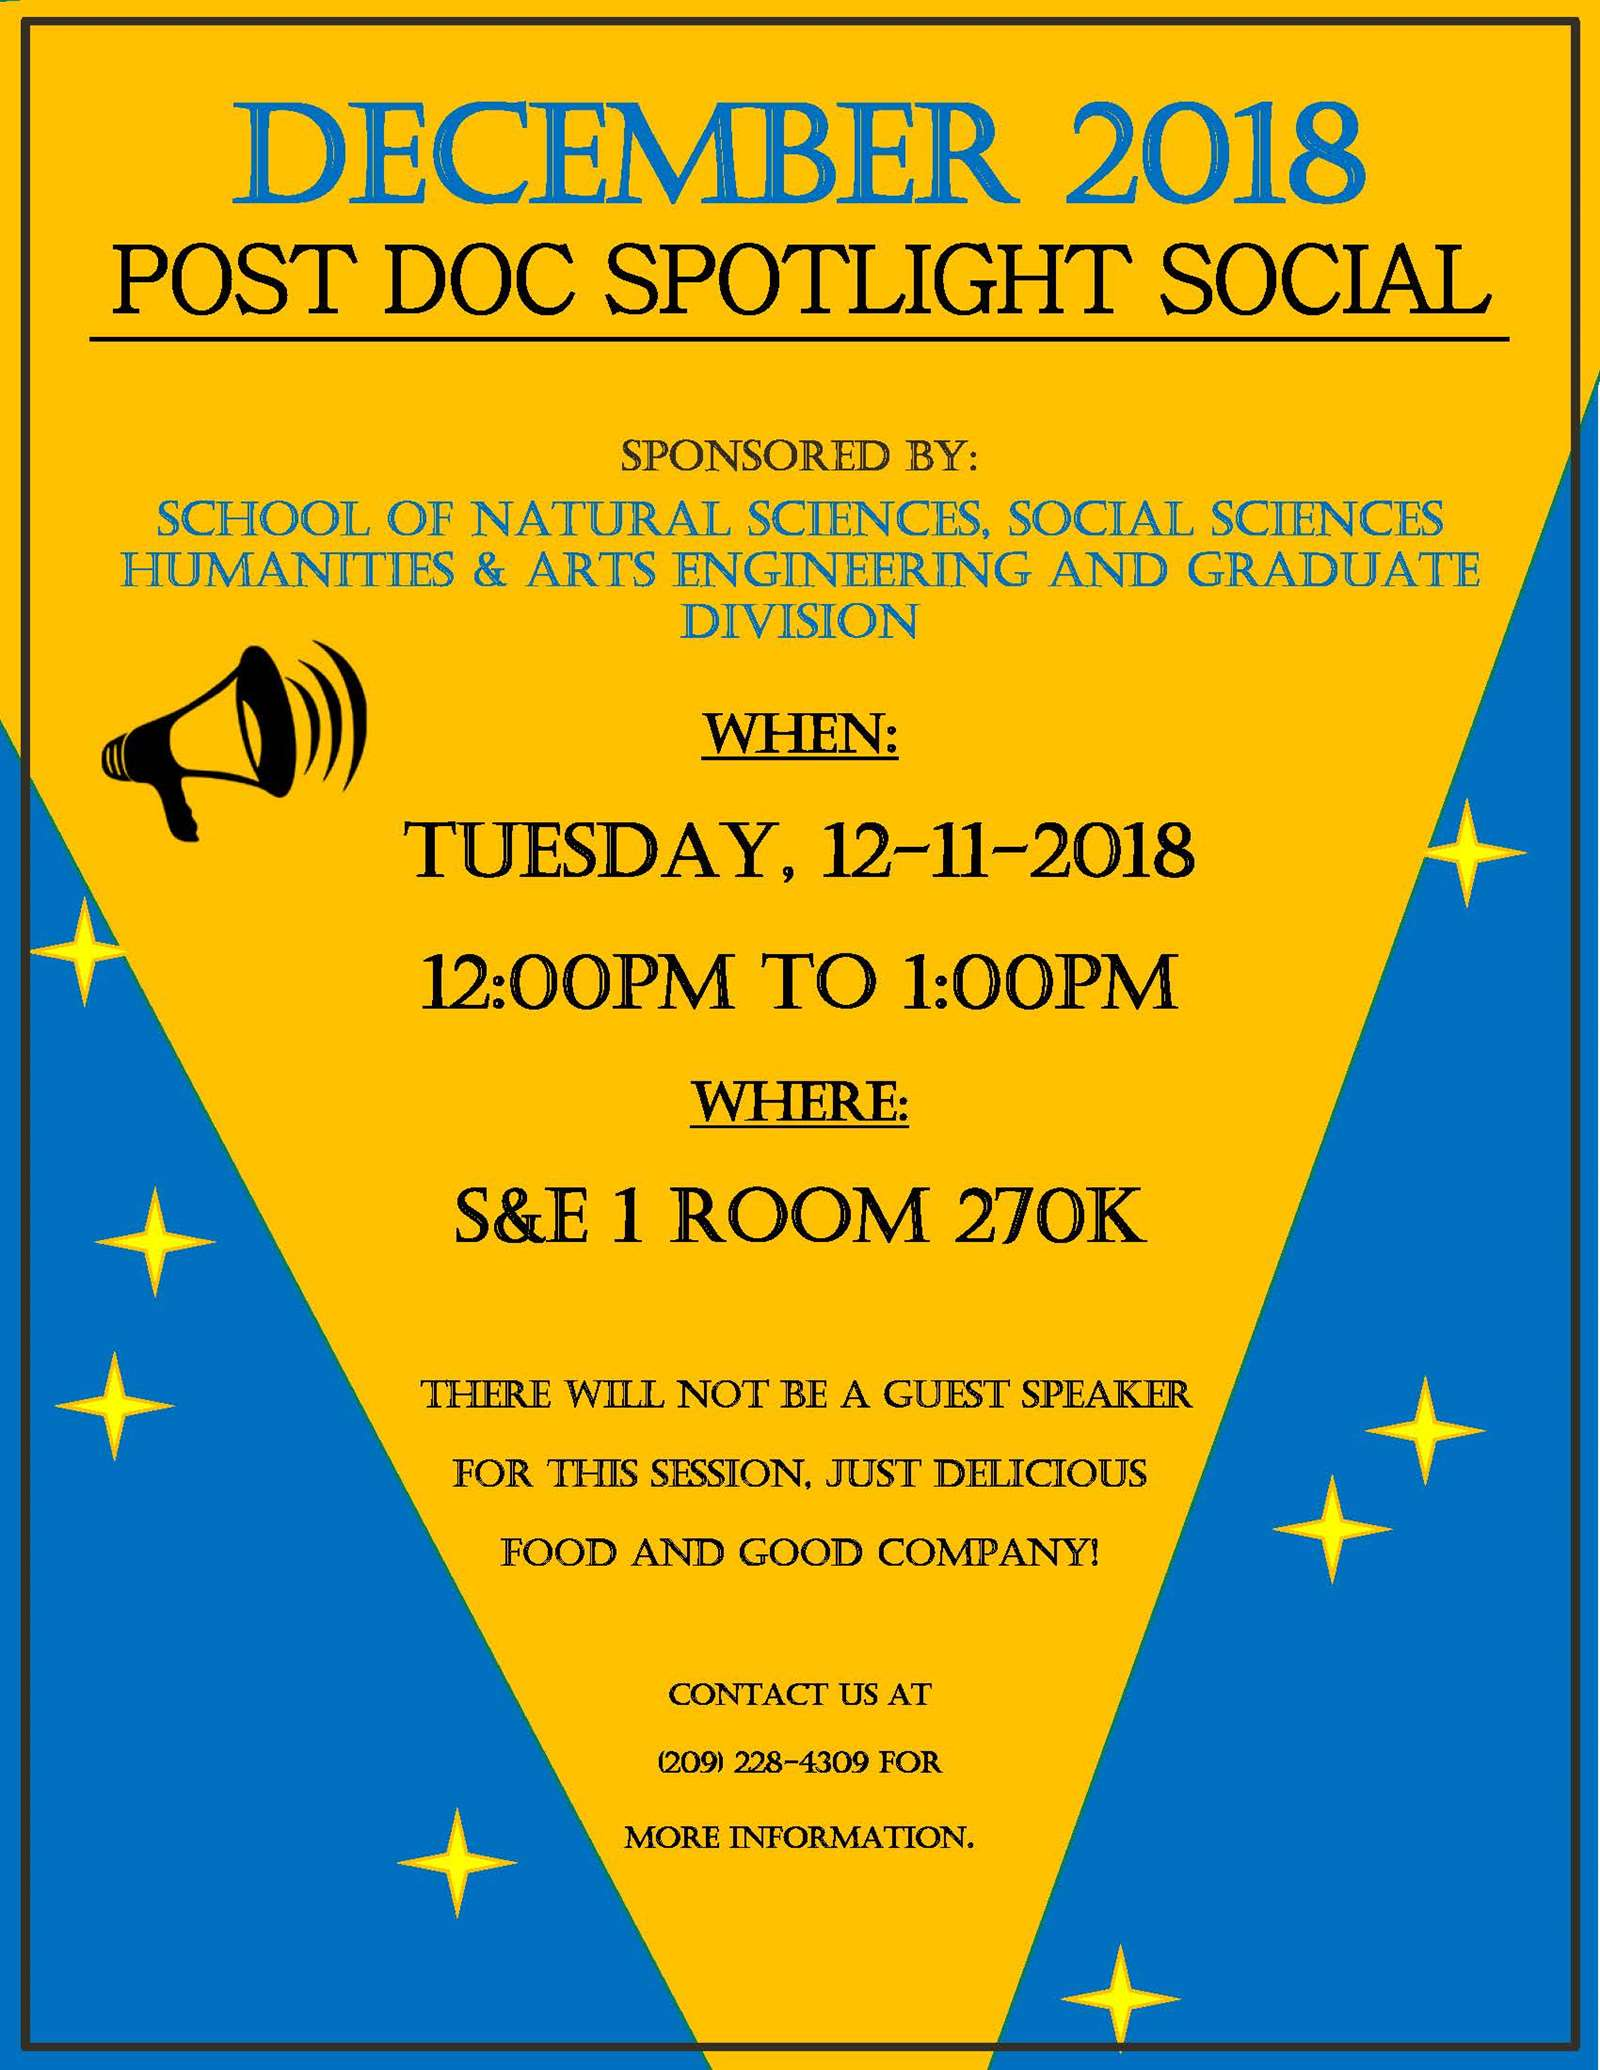 Post Doc Social